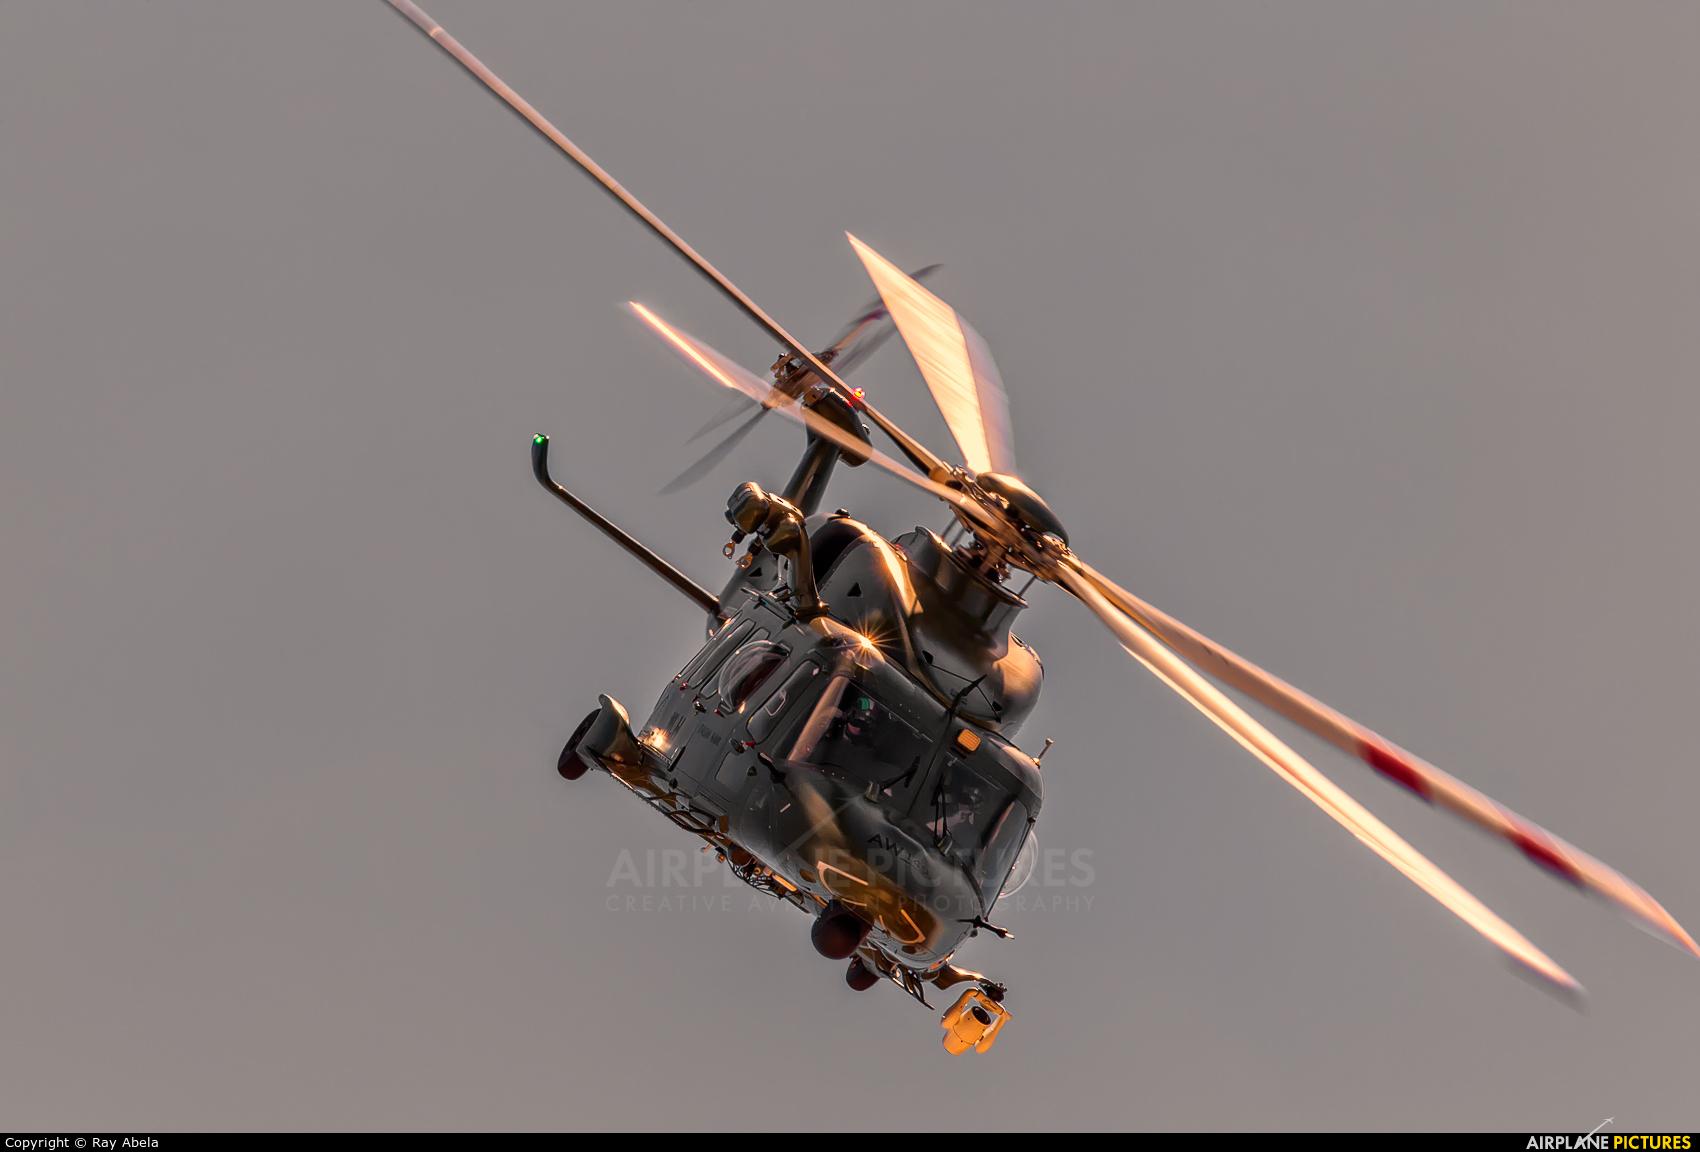 Agusta Westland CSX81890 aircraft at Malta Intl